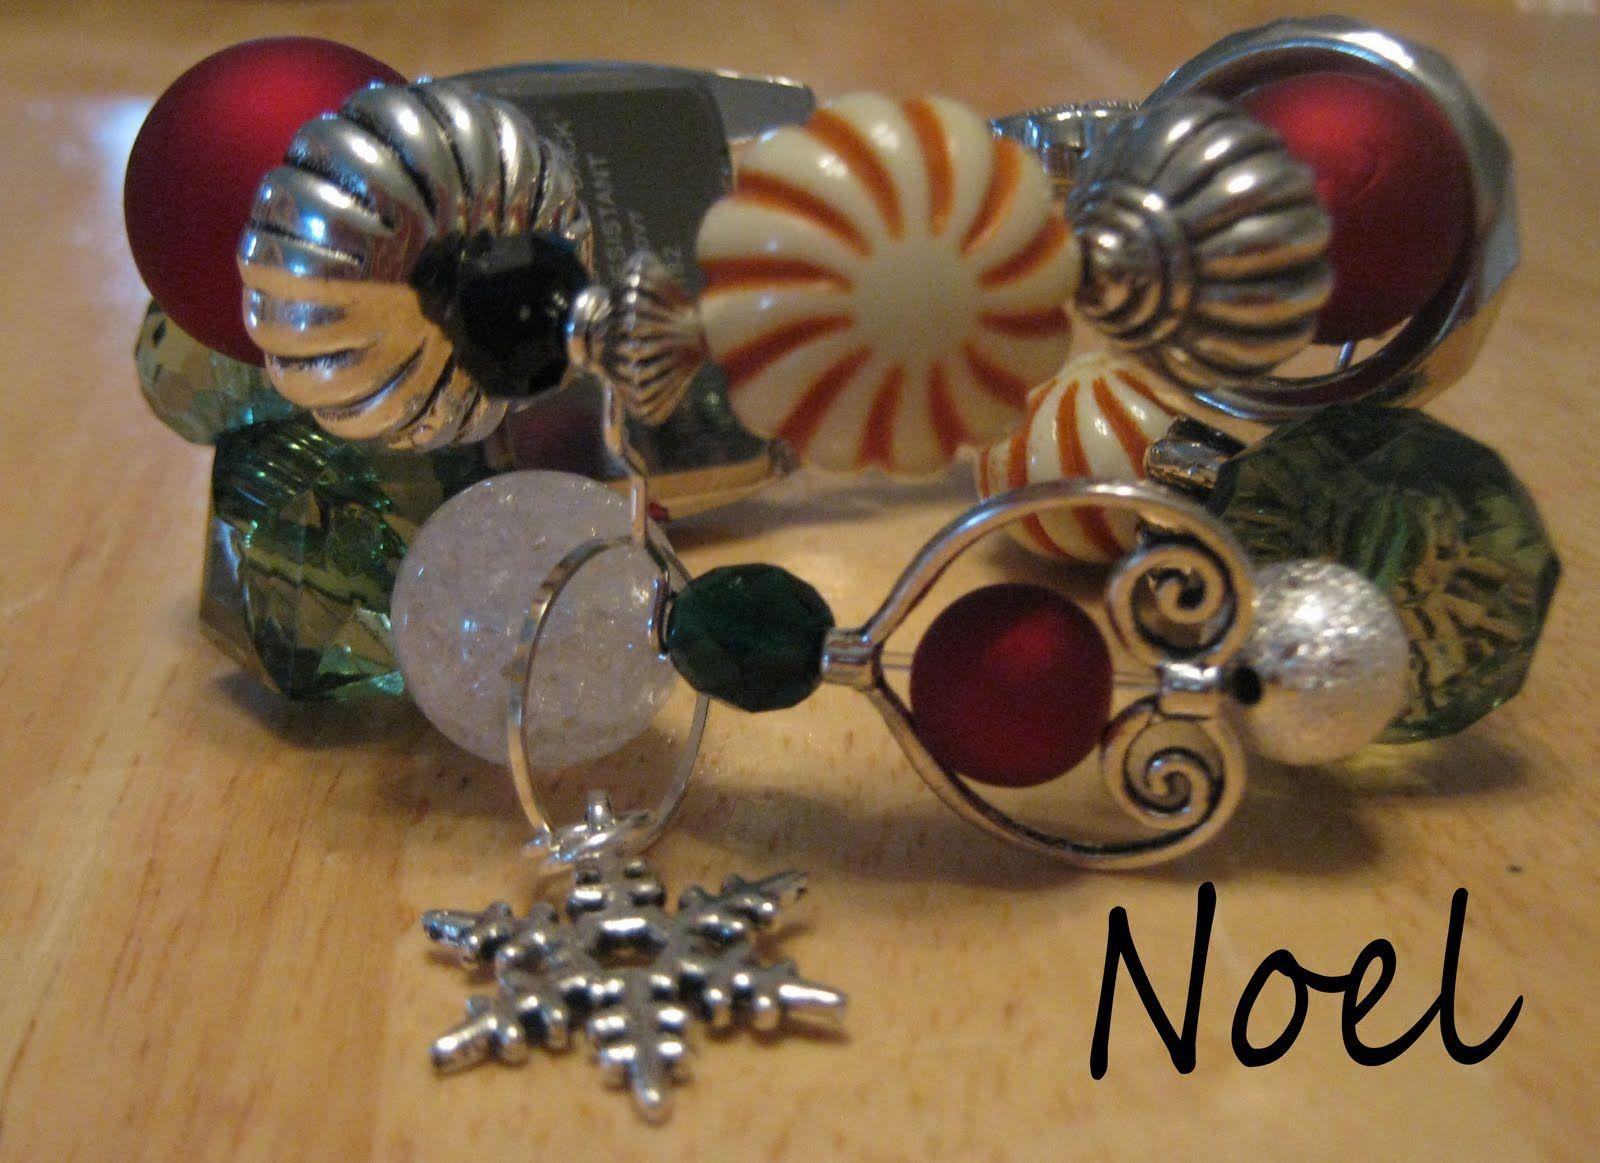 Christmas Interchangeable Watch Band, festive but tasteful.